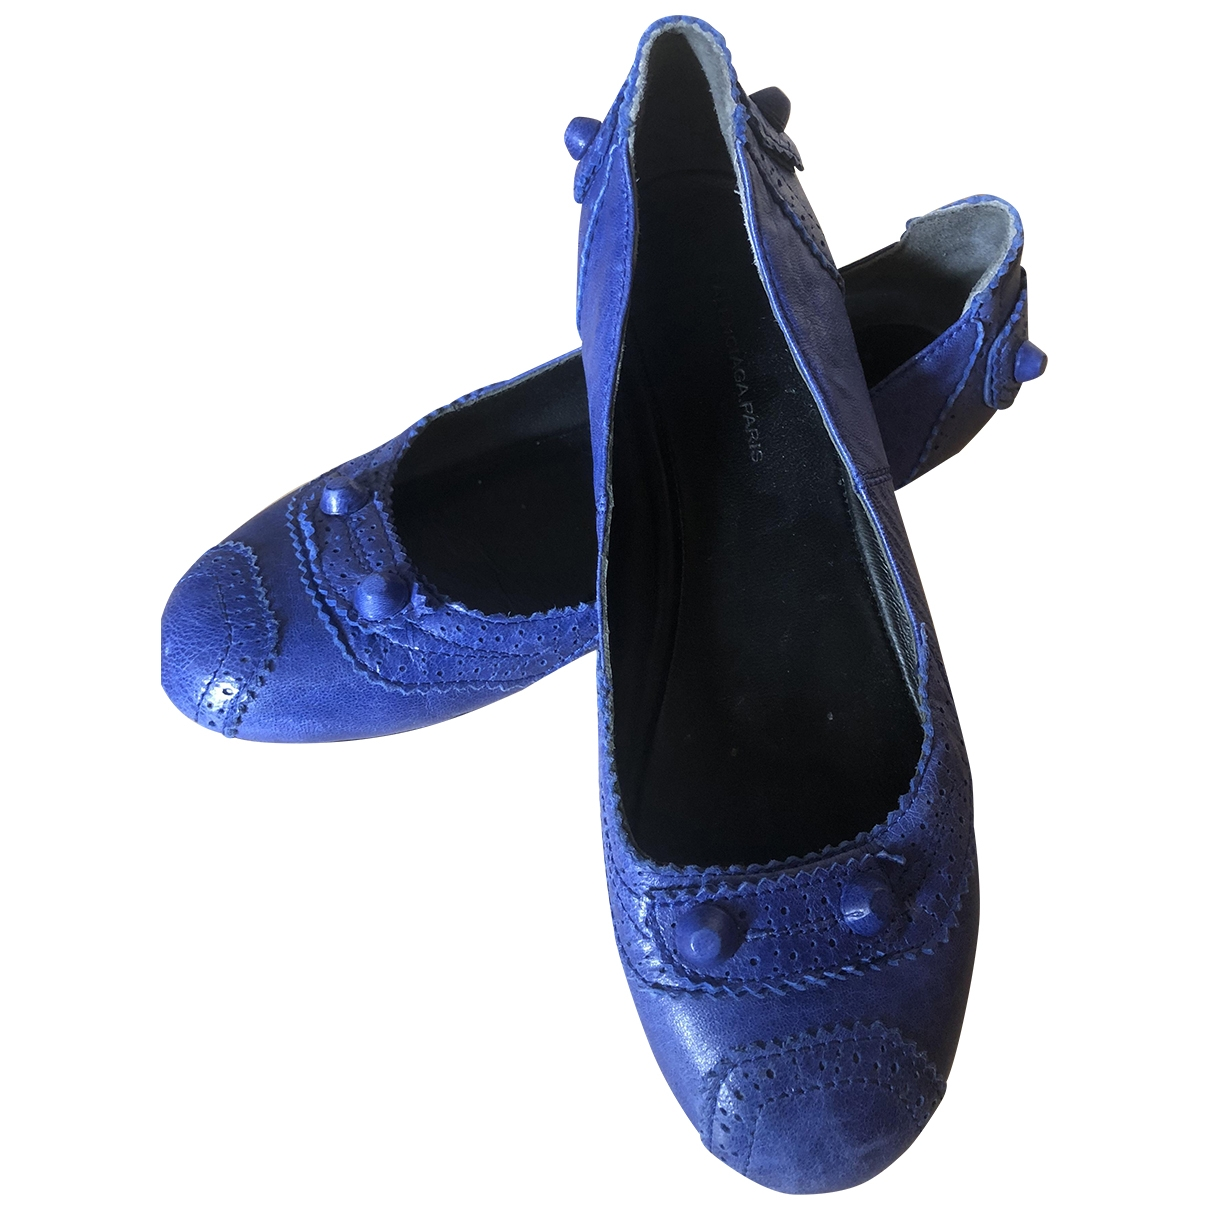 Balenciaga \N Blue Leather Ballet flats for Women 5 UK